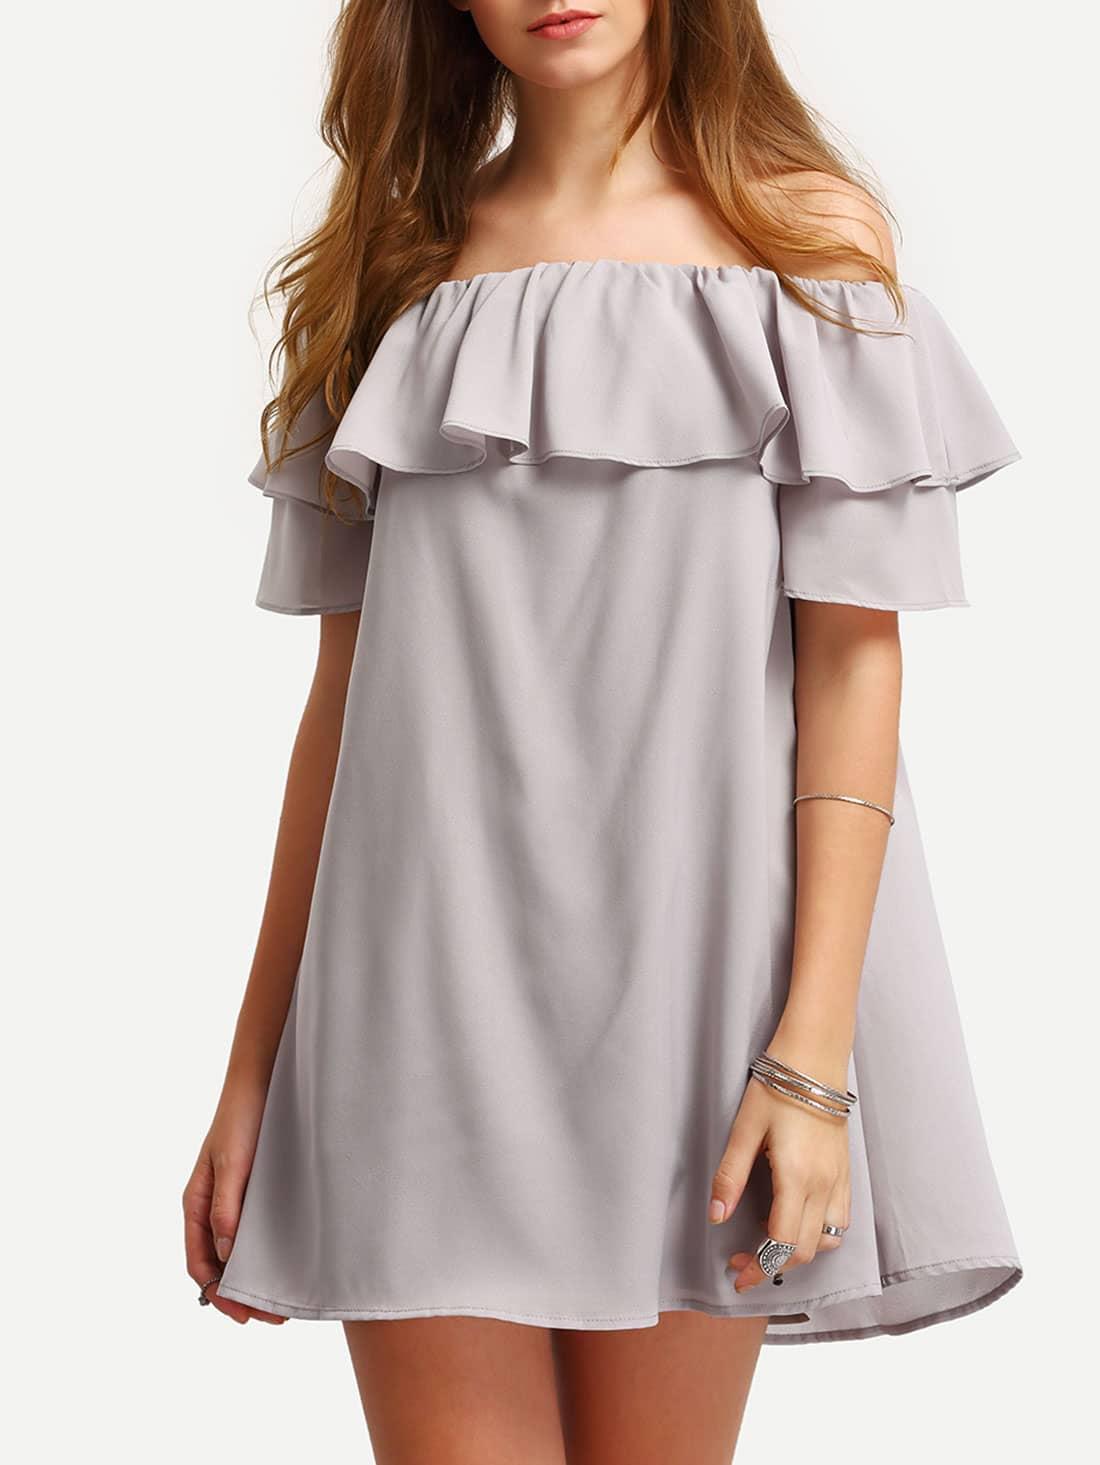 Grey Ruffle Off The Shoulder Shift Dress dress160420724